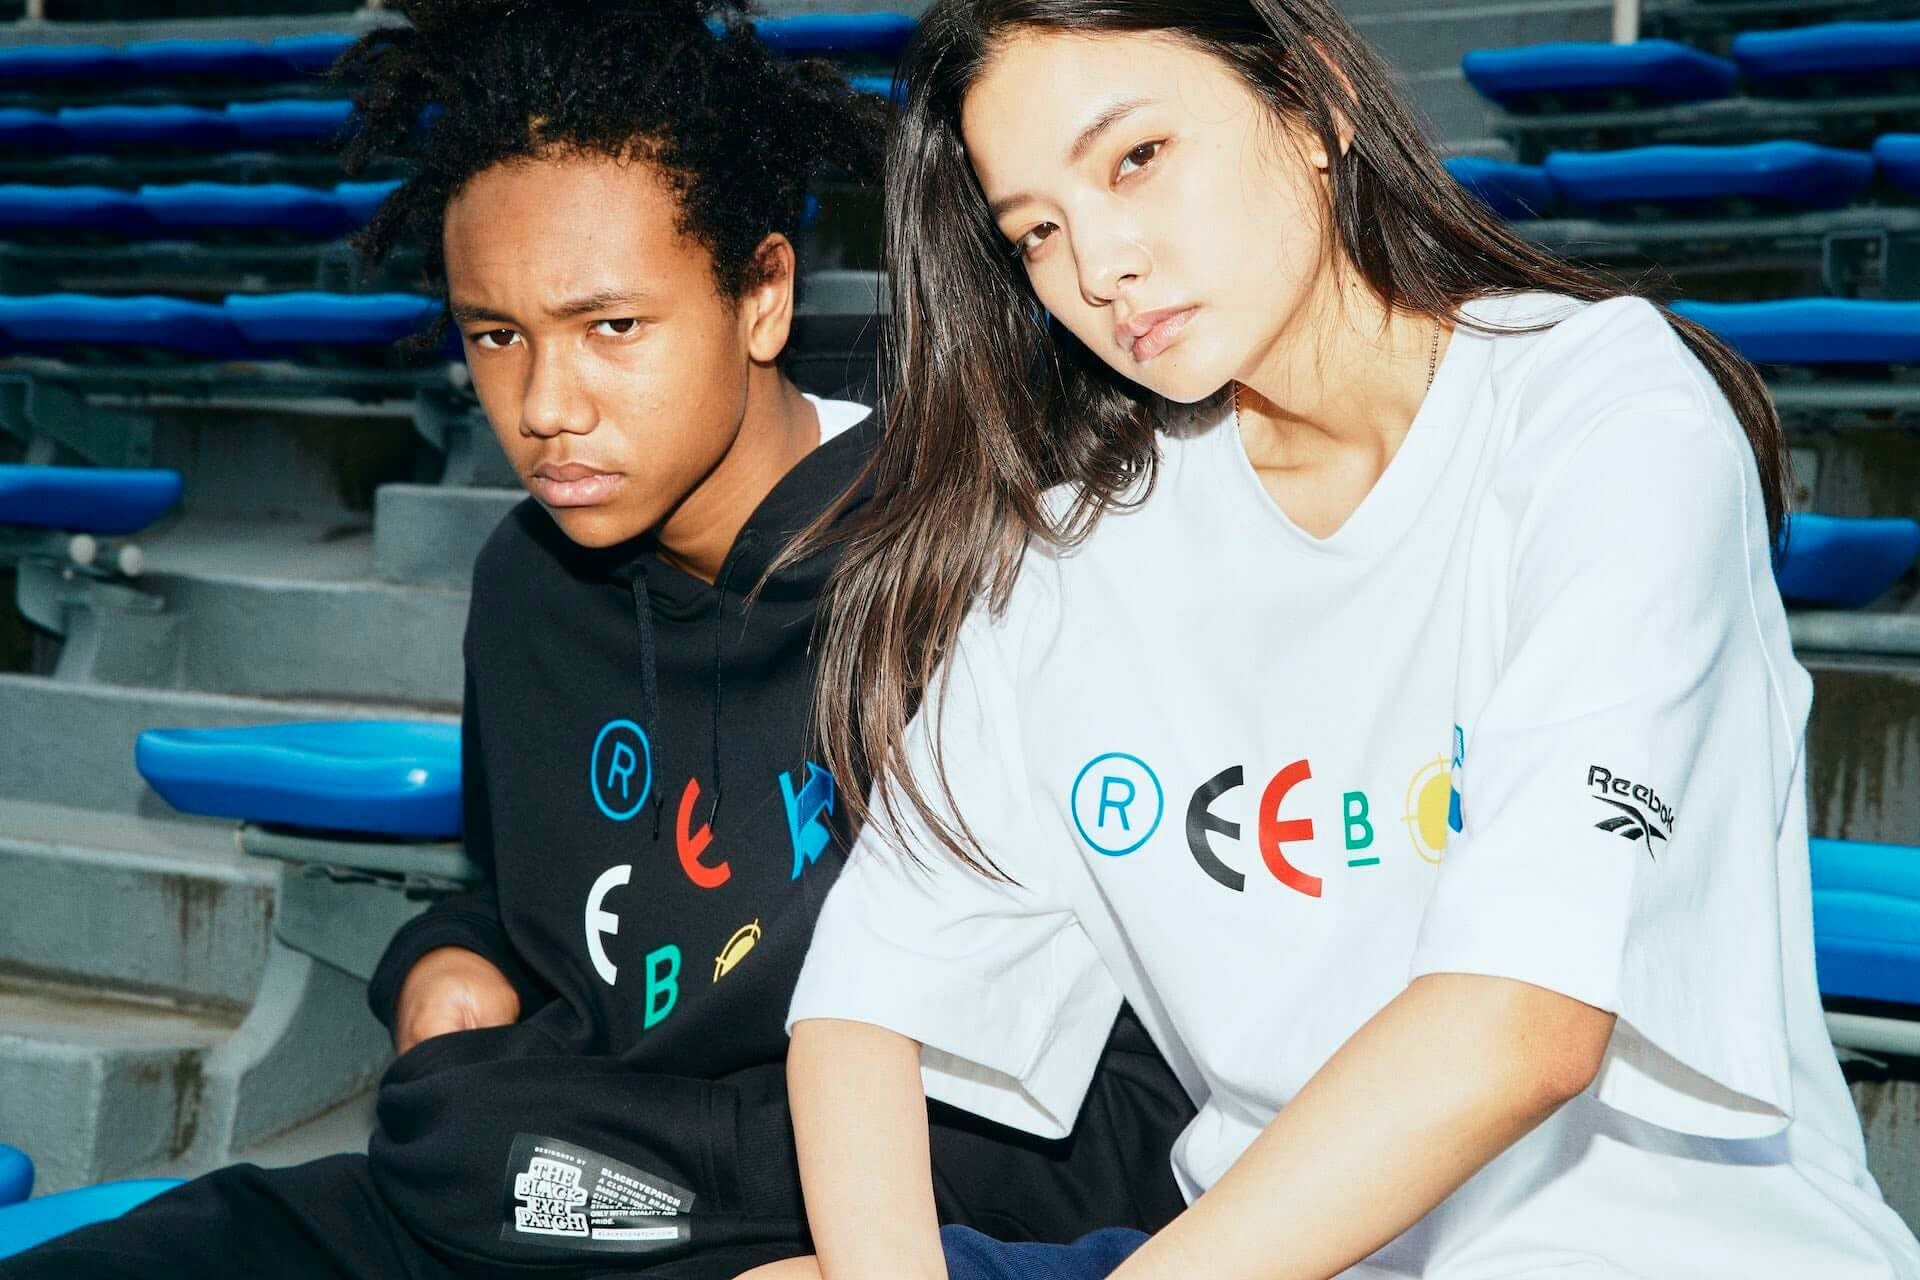 BlackEyePatchがReebokのデザインを再構築!「CLUB C BEP」やTシャツ含むフルコレクションが登場 lf200716_reebok_49-1920x1280